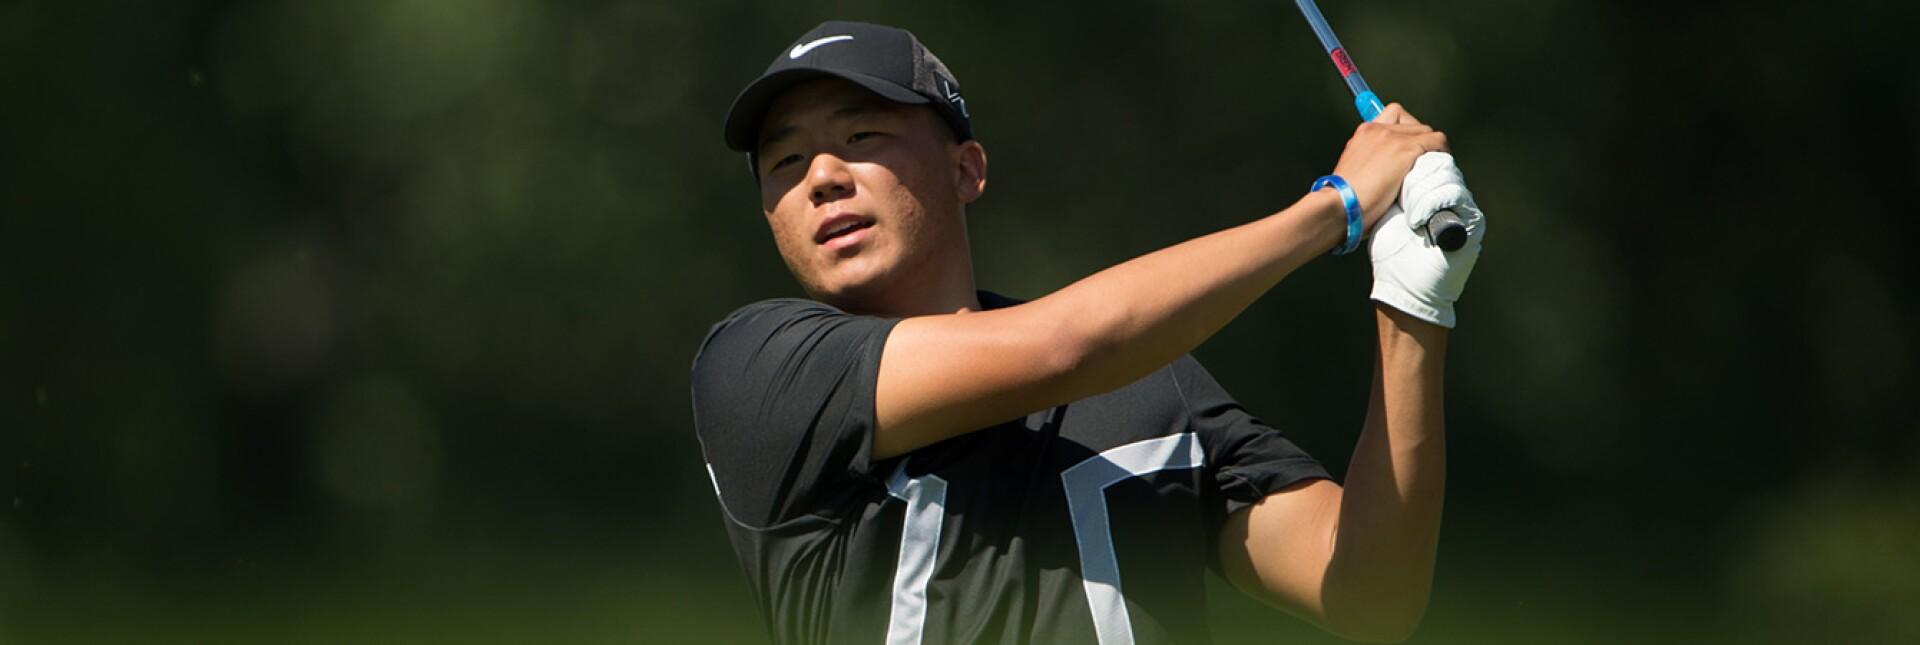 Norman-Xiong-Junior-Ryder-Cup.jpg